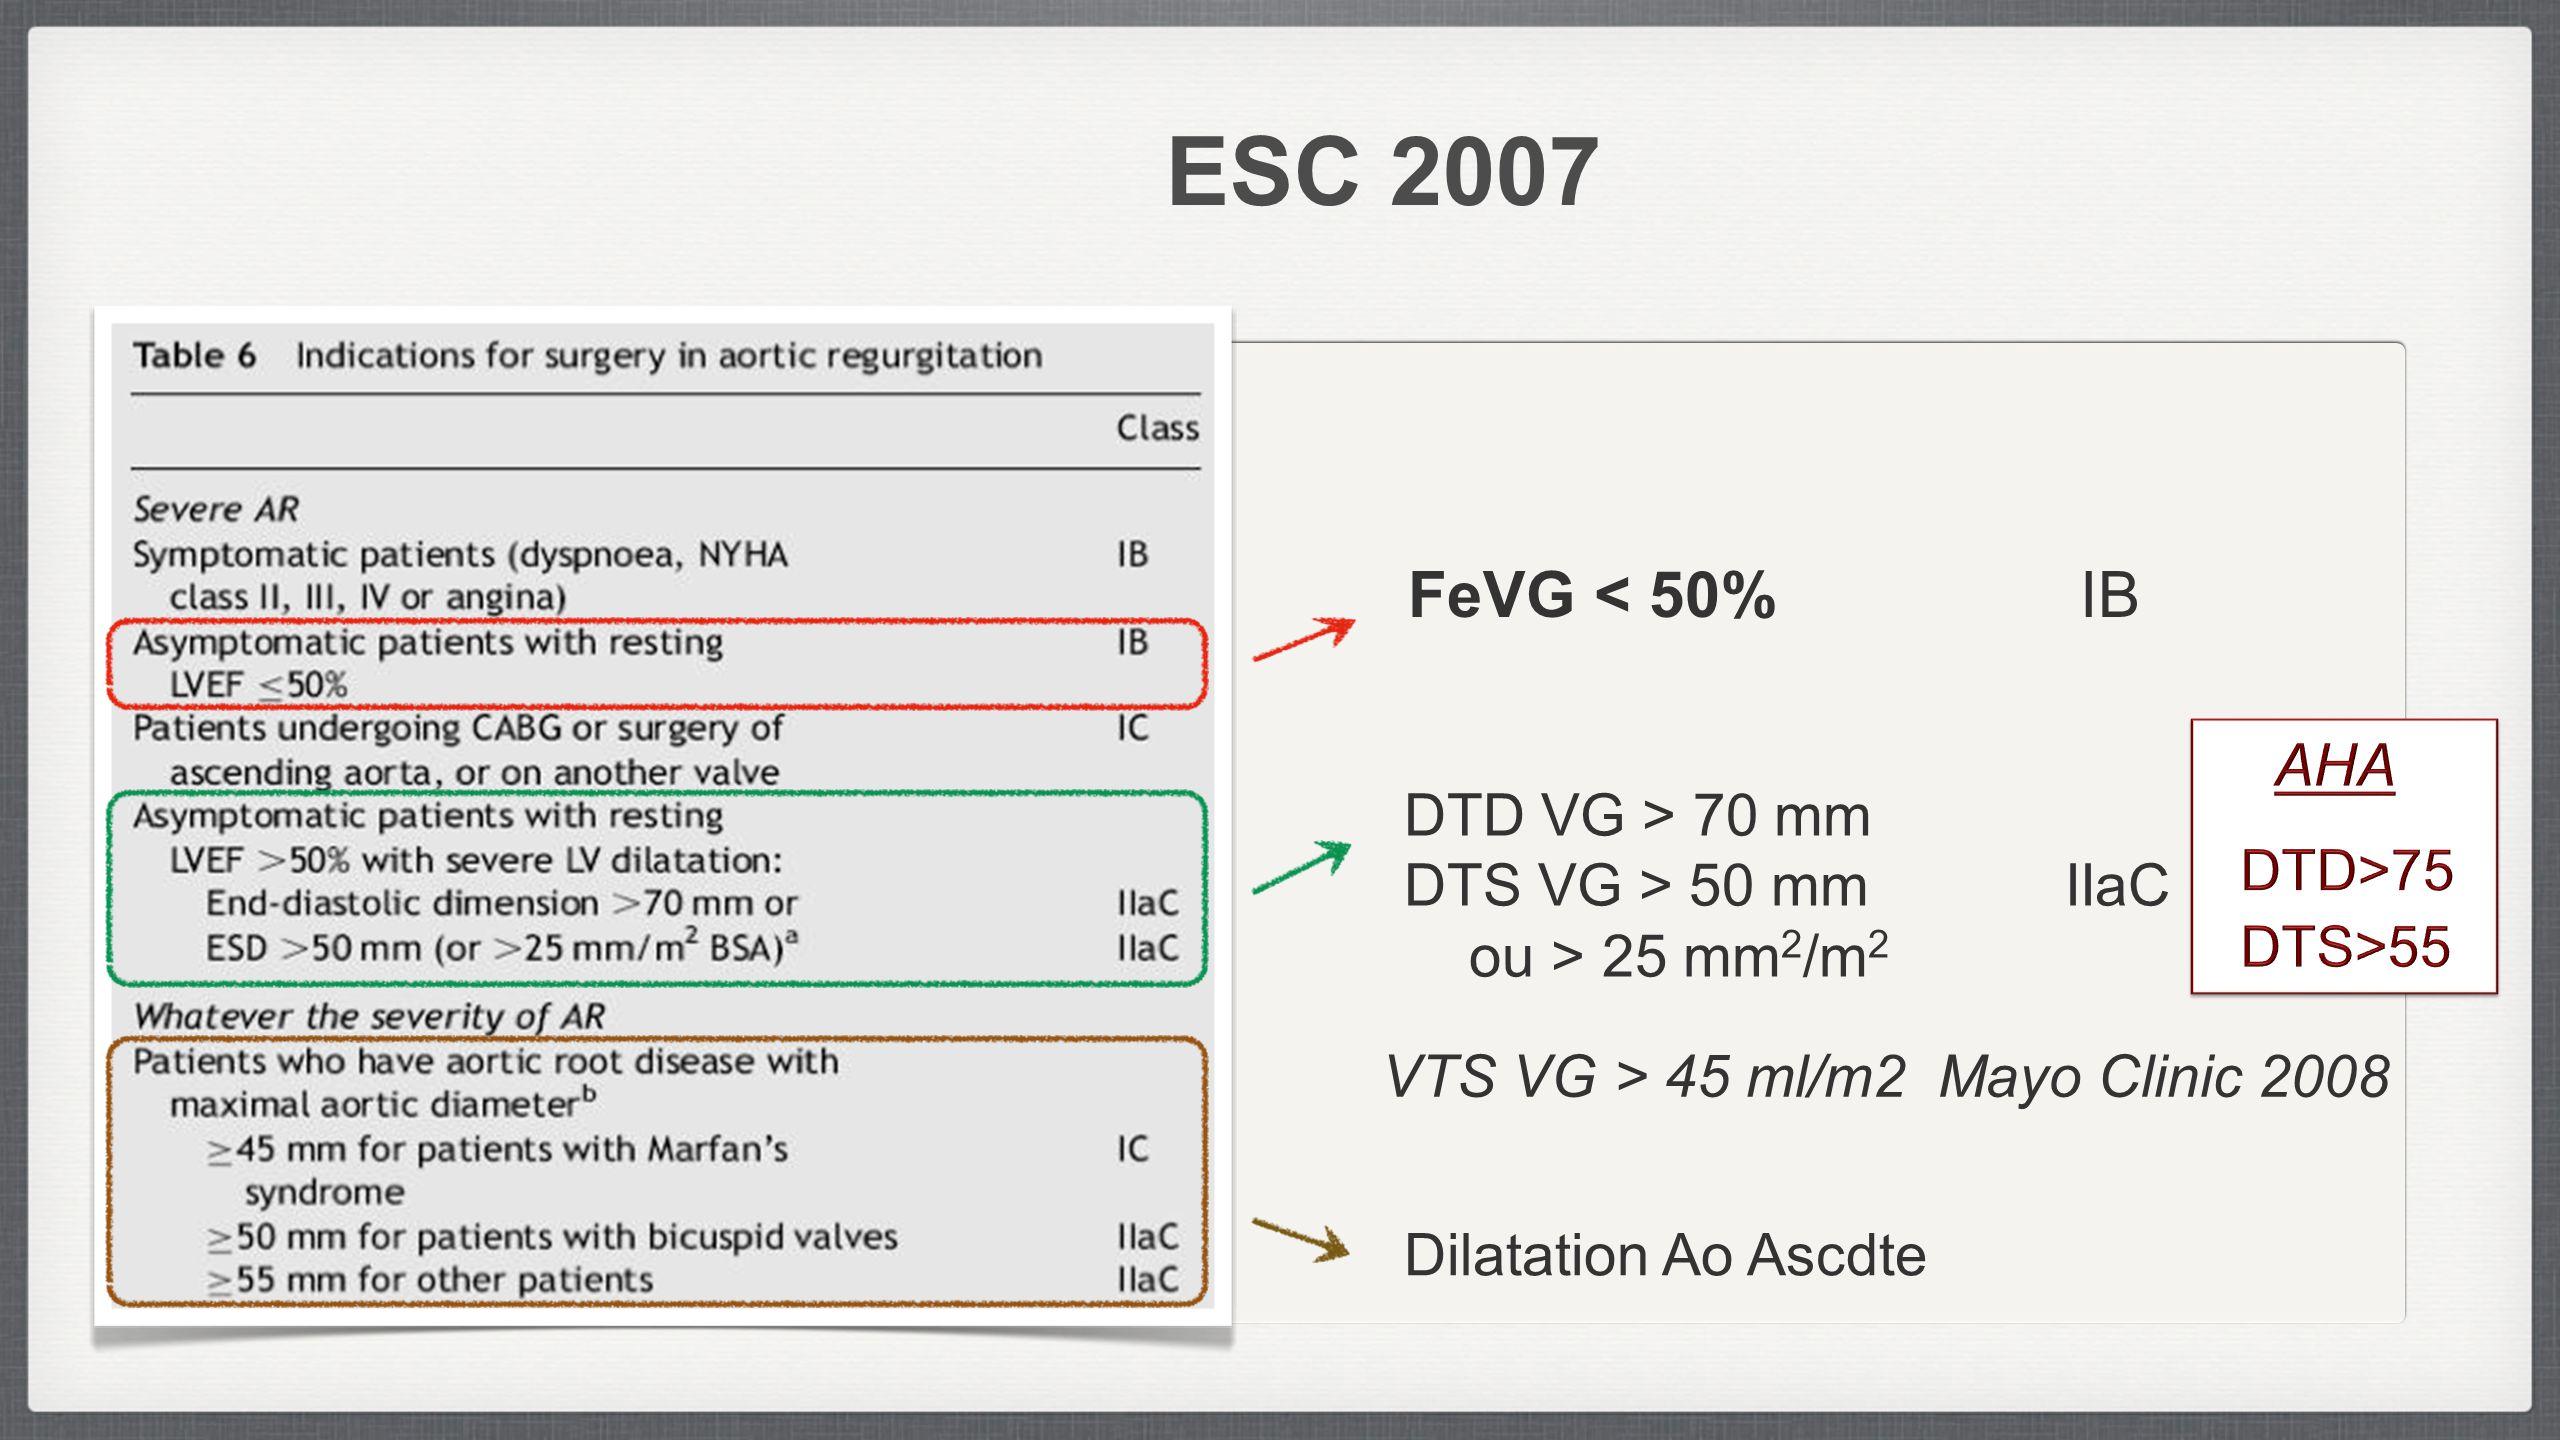 ESC 2007 FeVG < 50% IB AHA DTD VG > 70 mm DTS VG > 50 mm IIaC